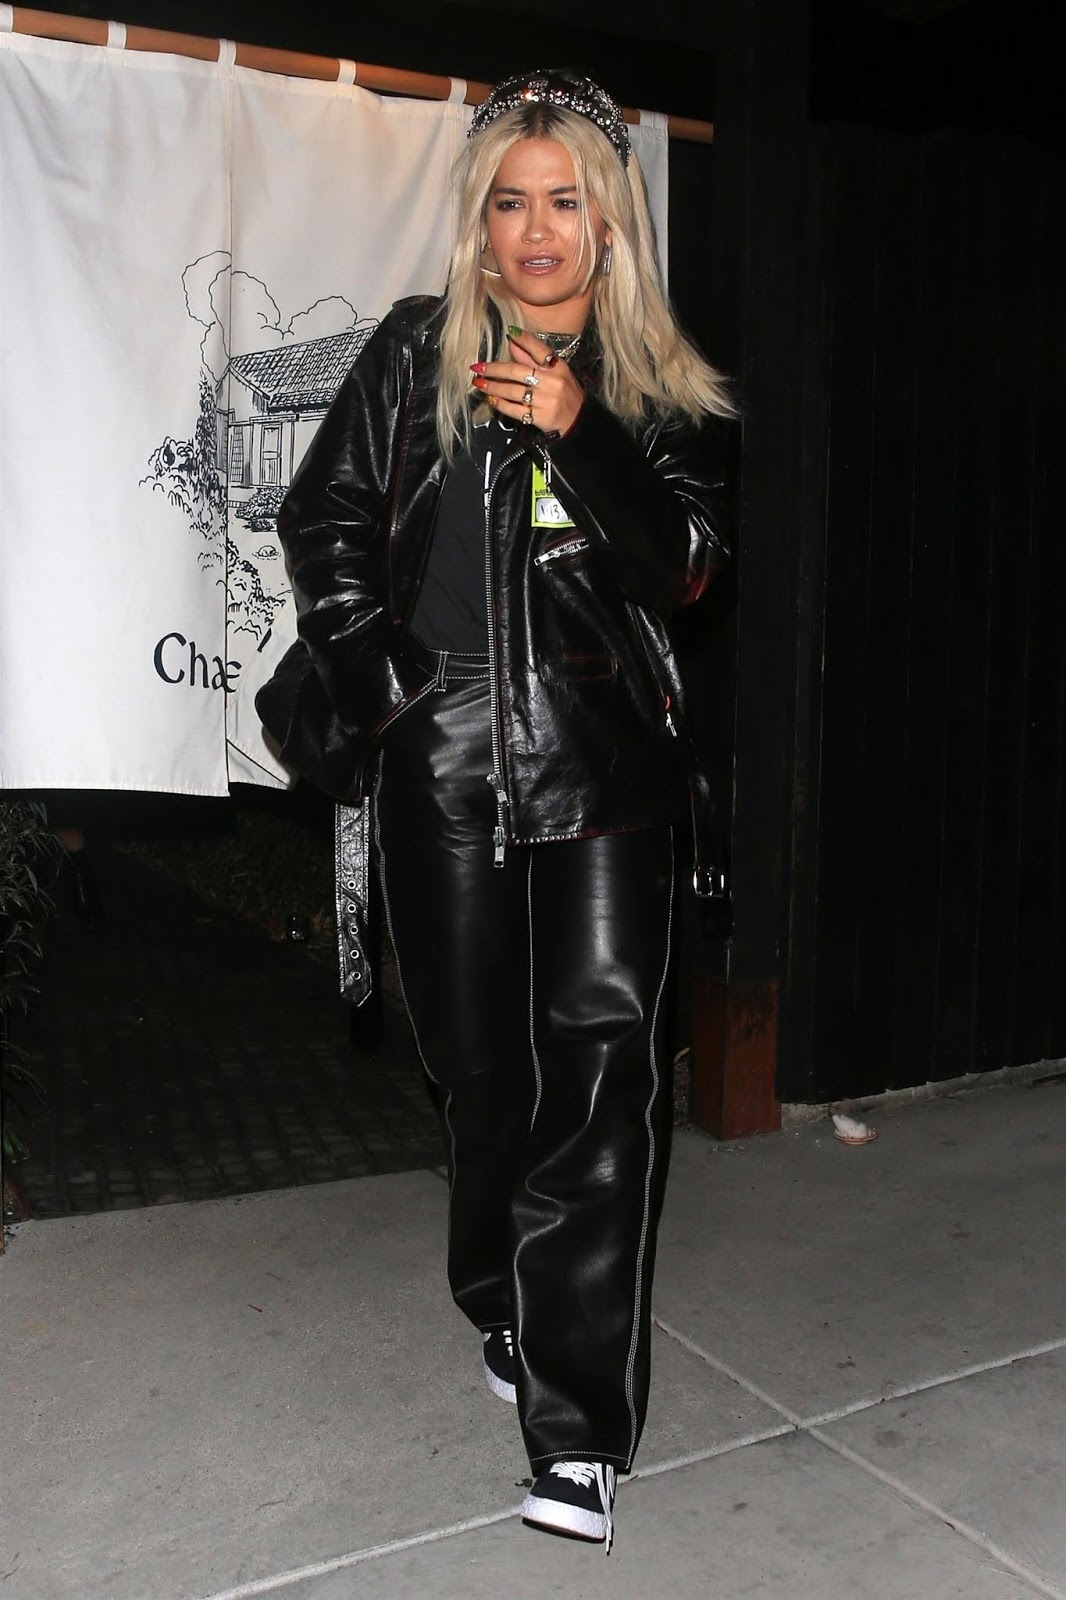 Rita Ora - at Chateau Hanare sushi restaurant in Los Angeles - 01/21/2019